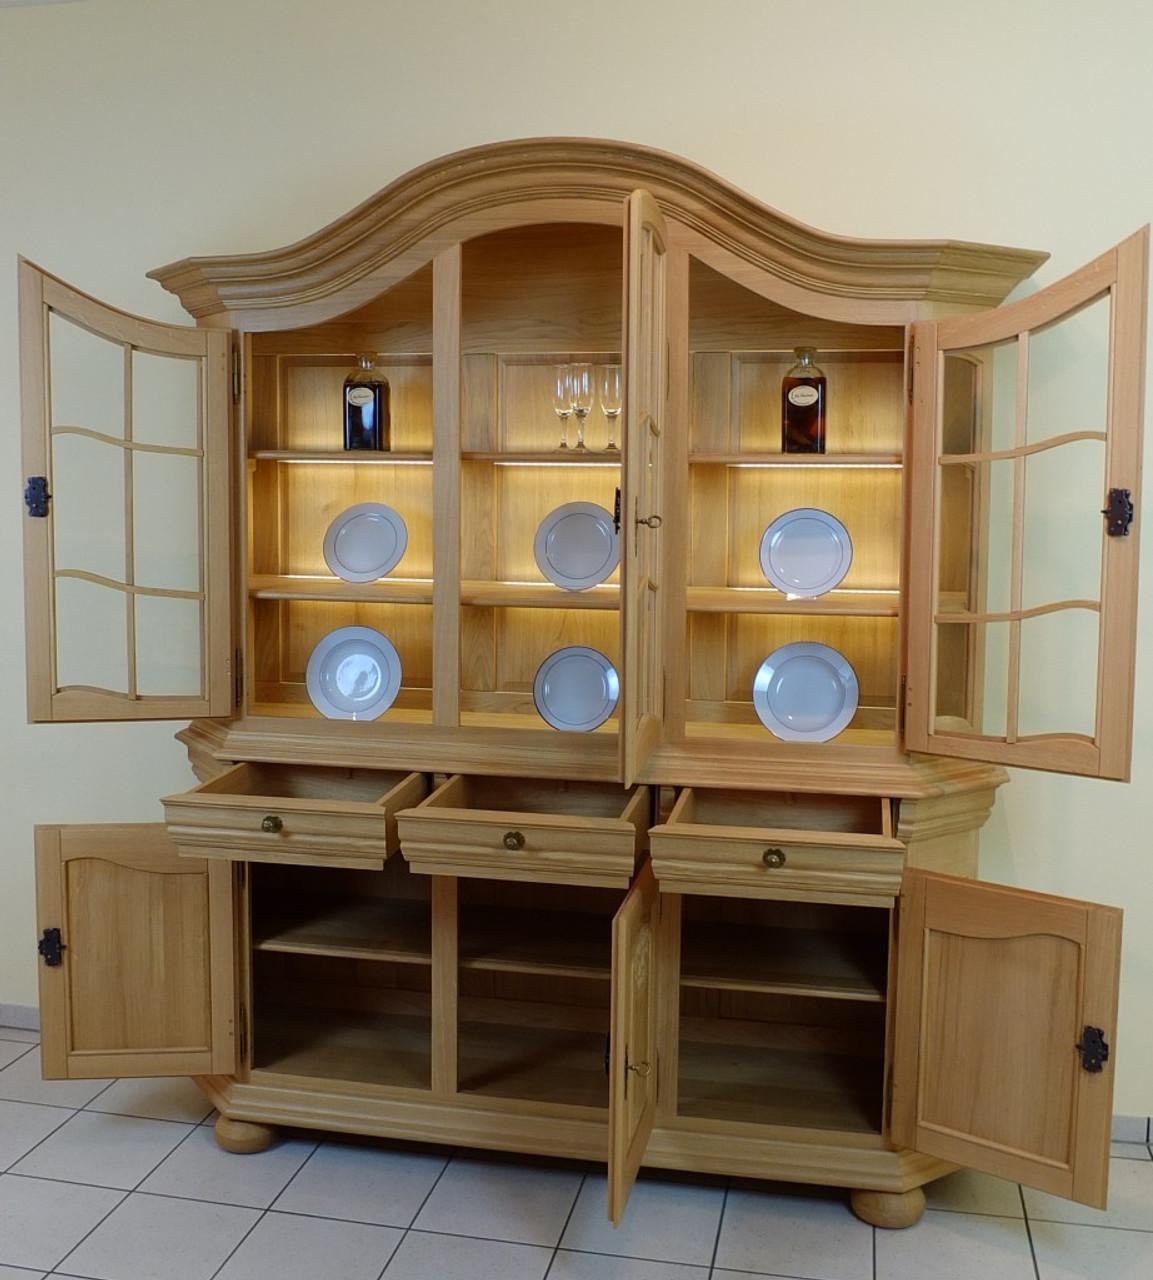 soltau vitrine bogenvitrine glasvitrine rustikal gelaugt eiche voll massiv modell. Black Bedroom Furniture Sets. Home Design Ideas